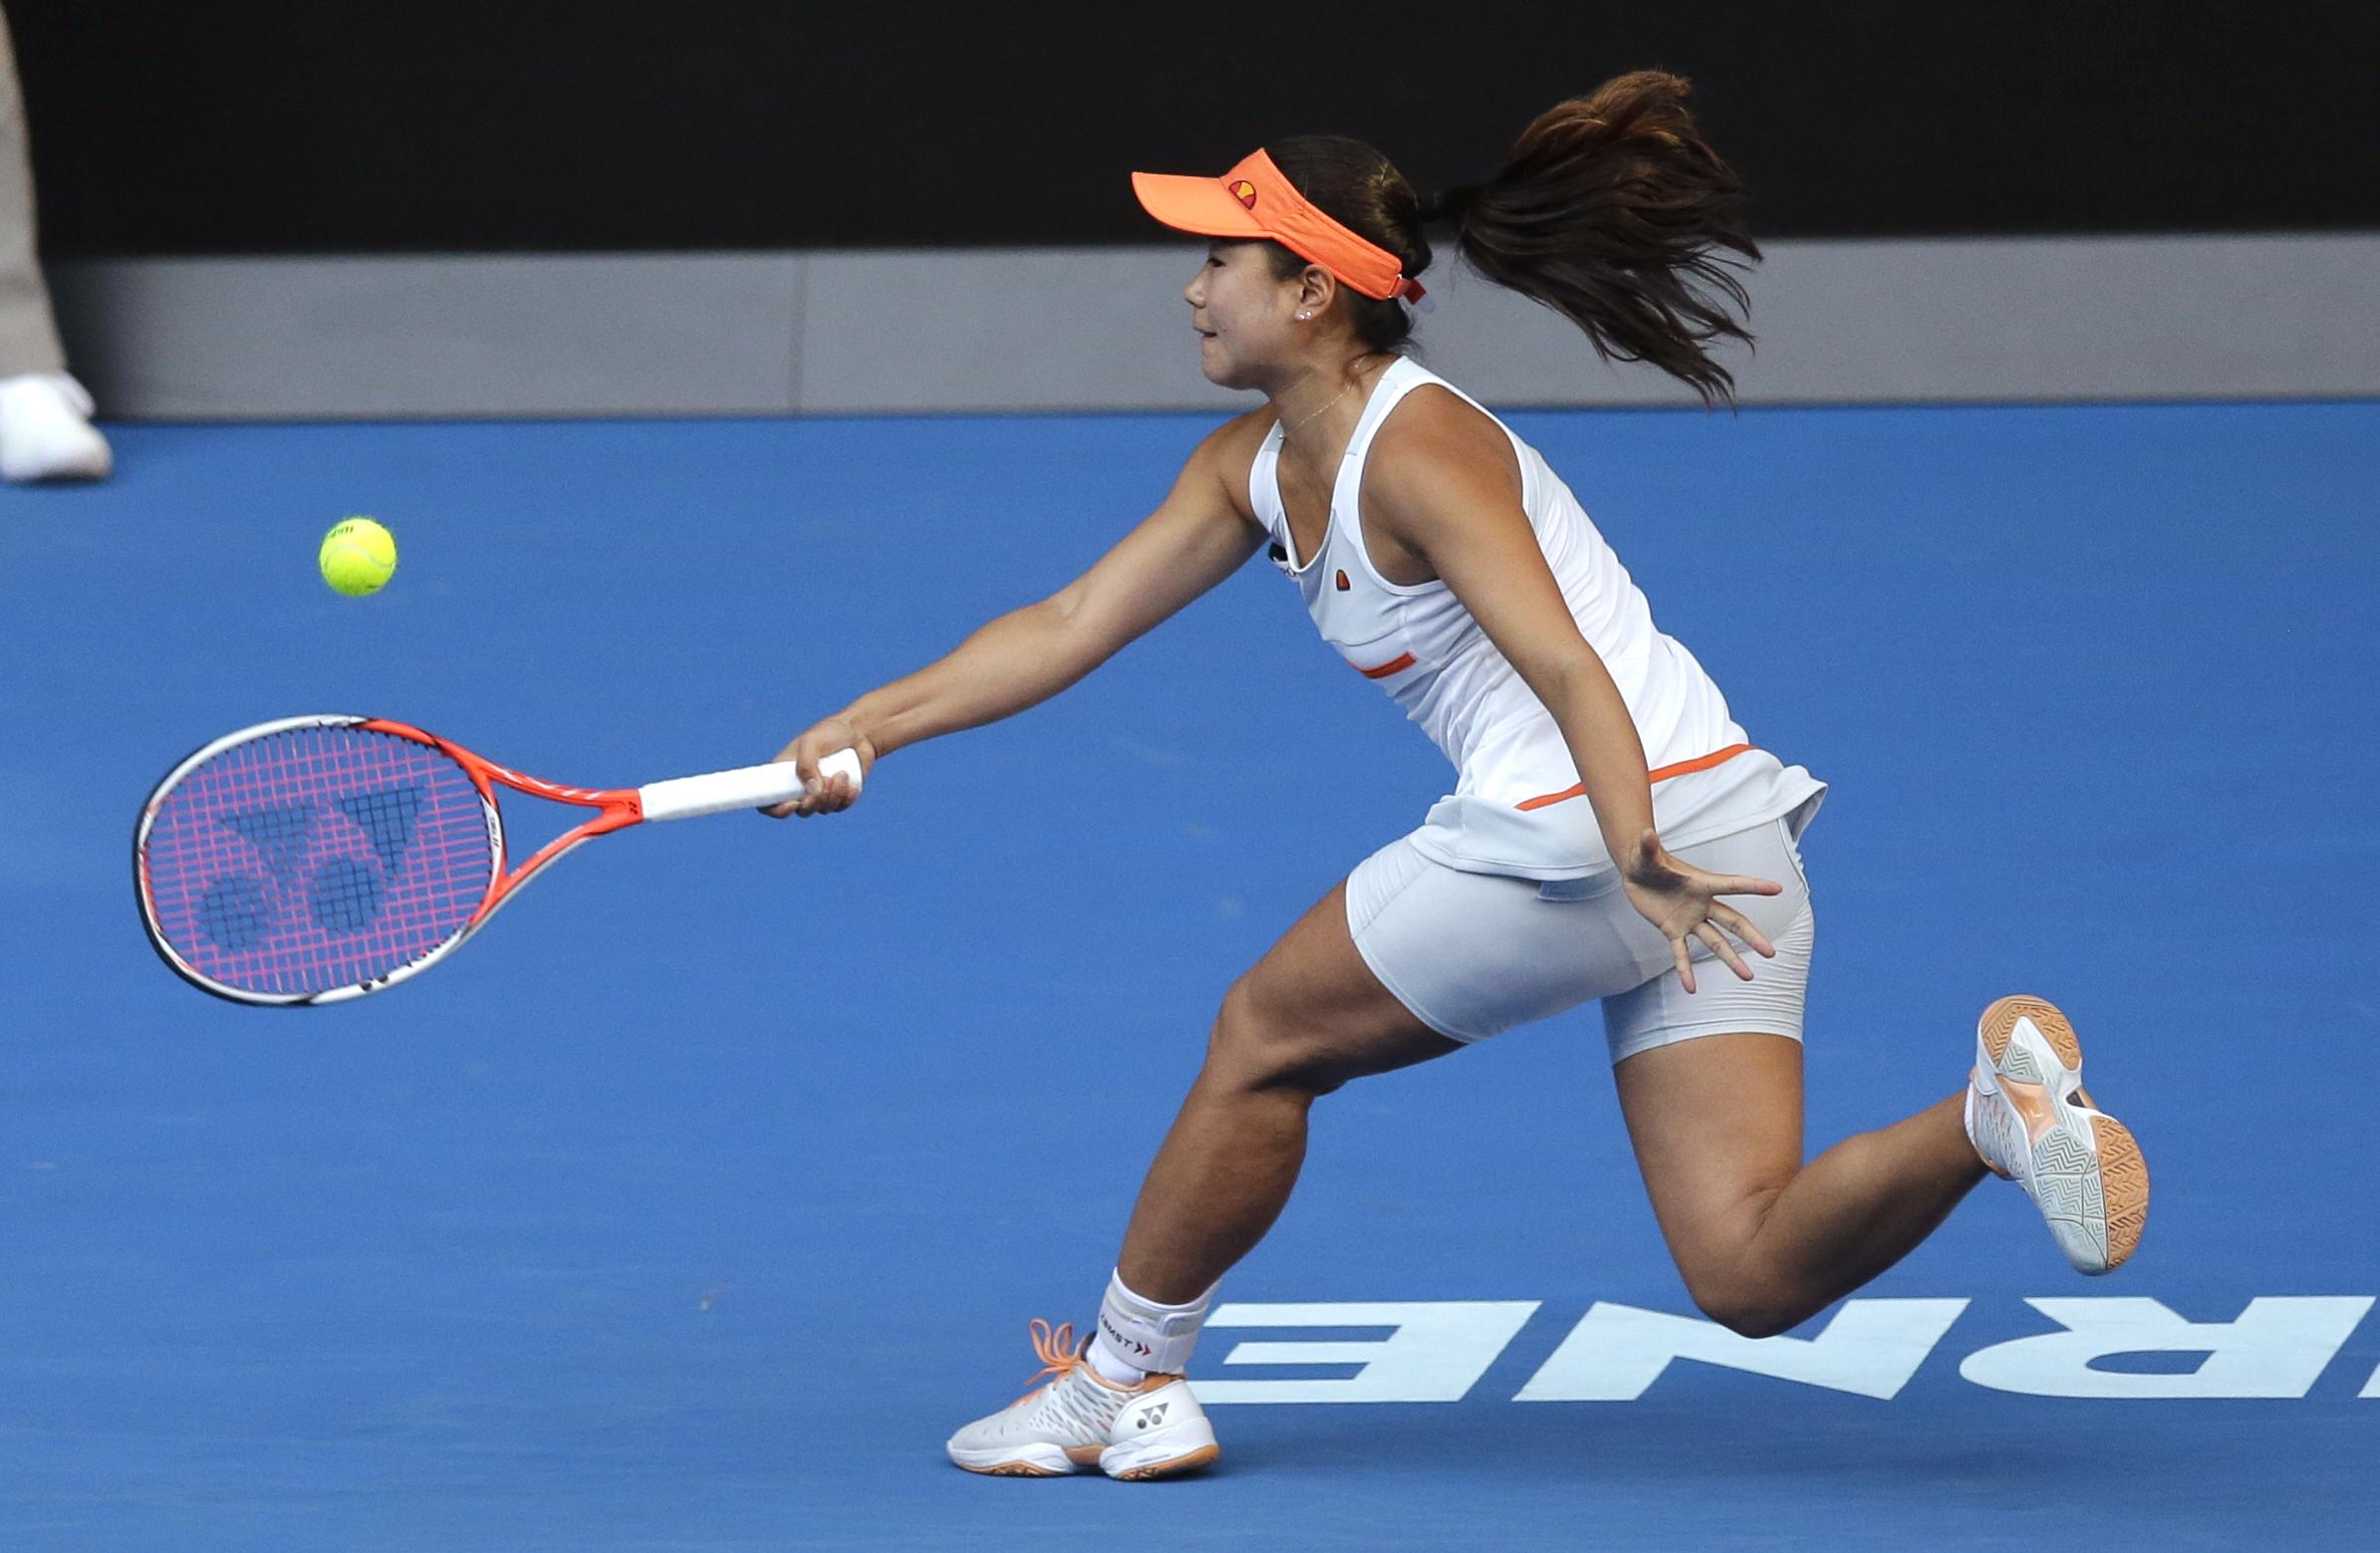 australian_open_tennis-9d3c9c5ed02c429a9_r9388.jpeg